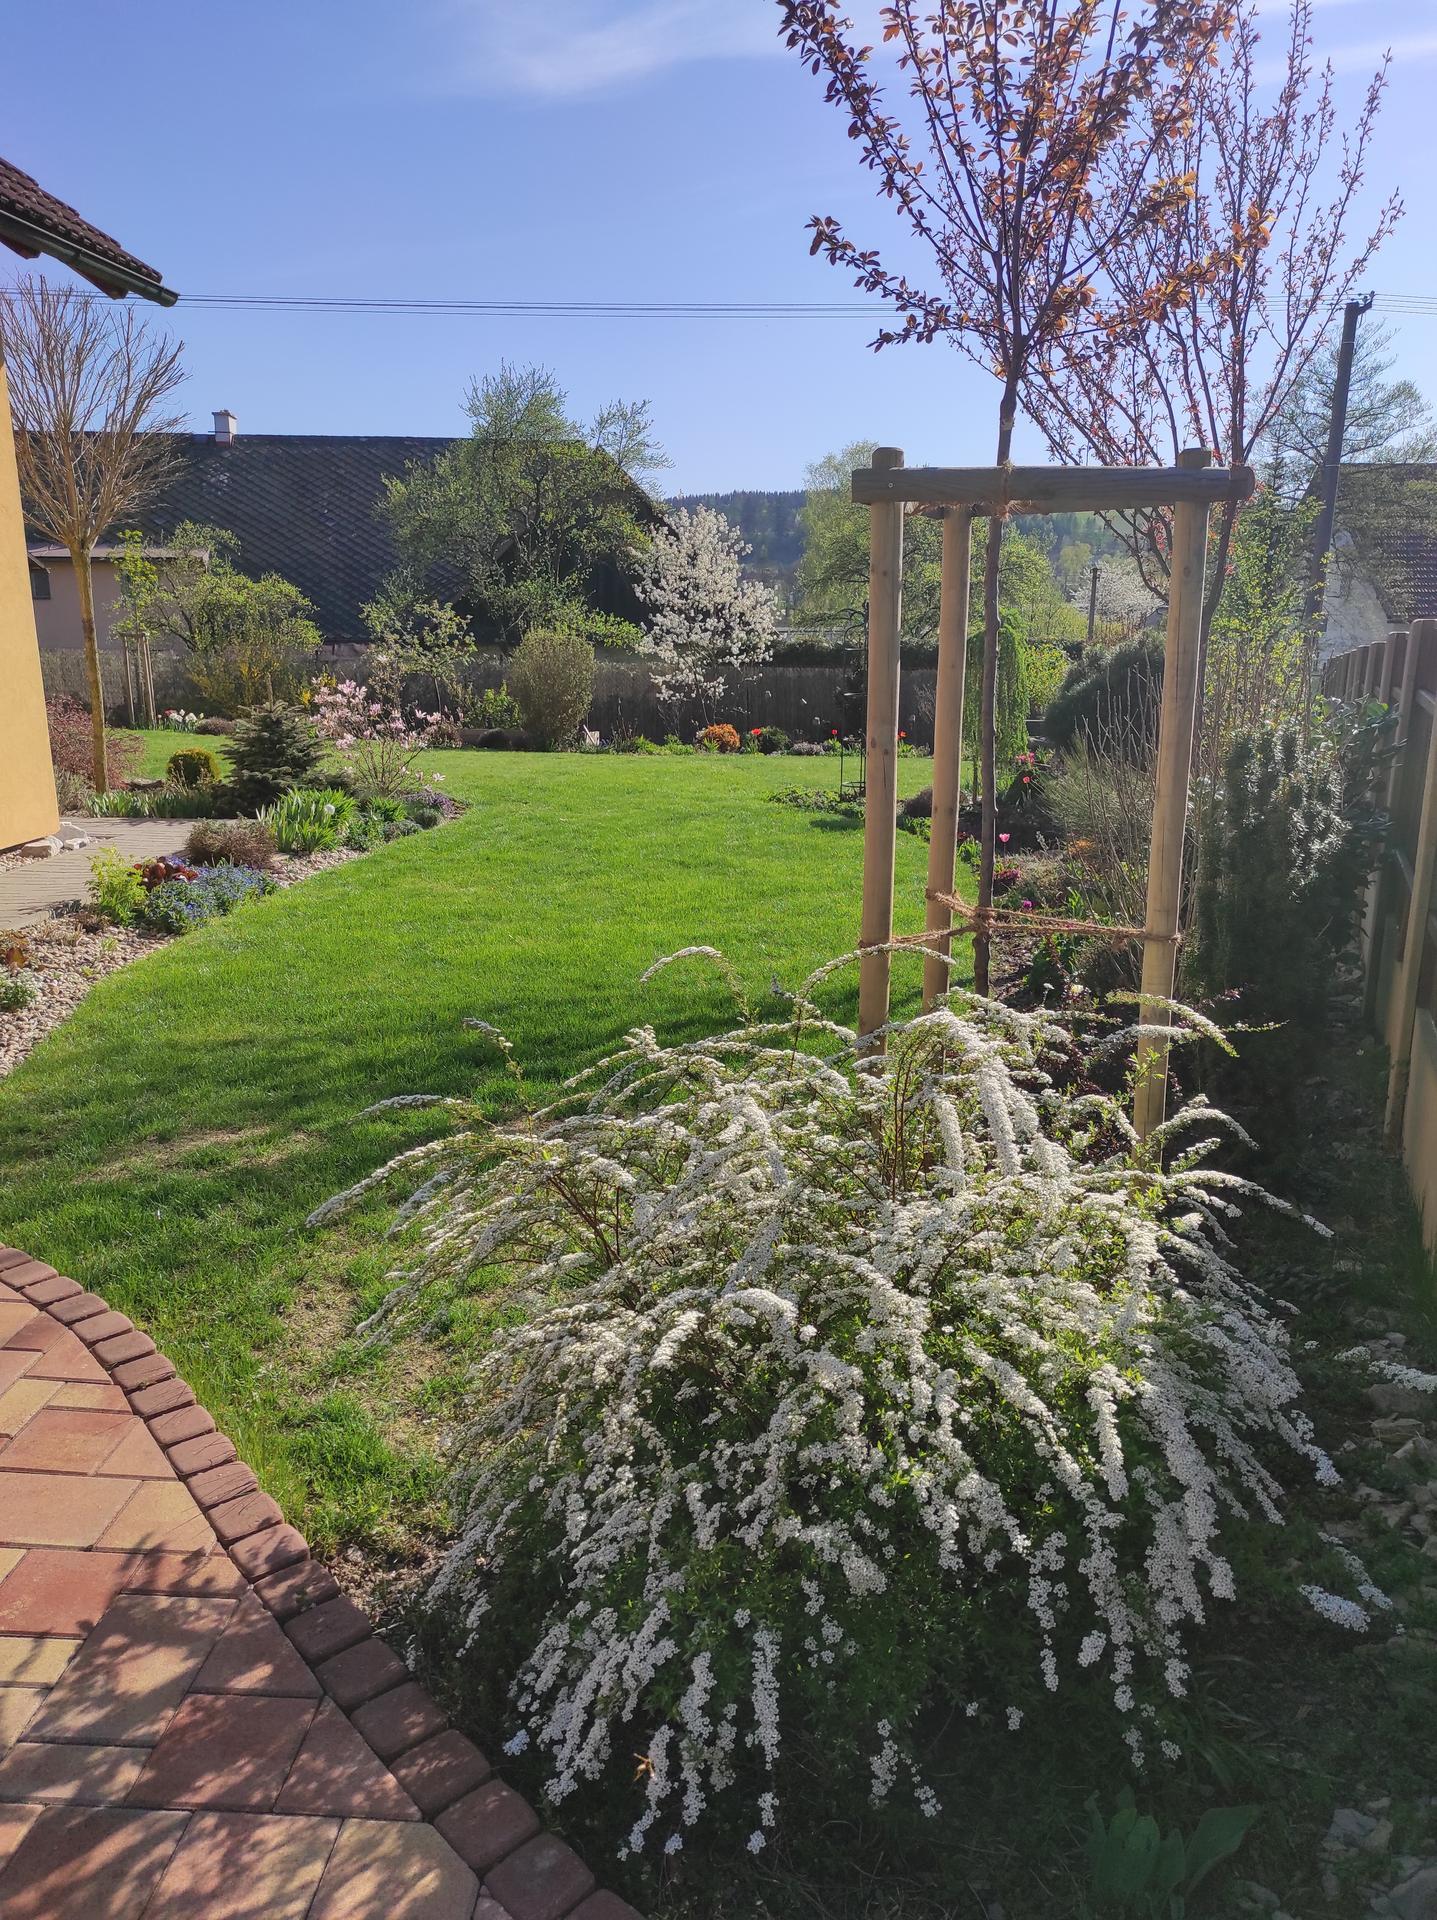 Zahrada 2021 - Obrázek č. 3